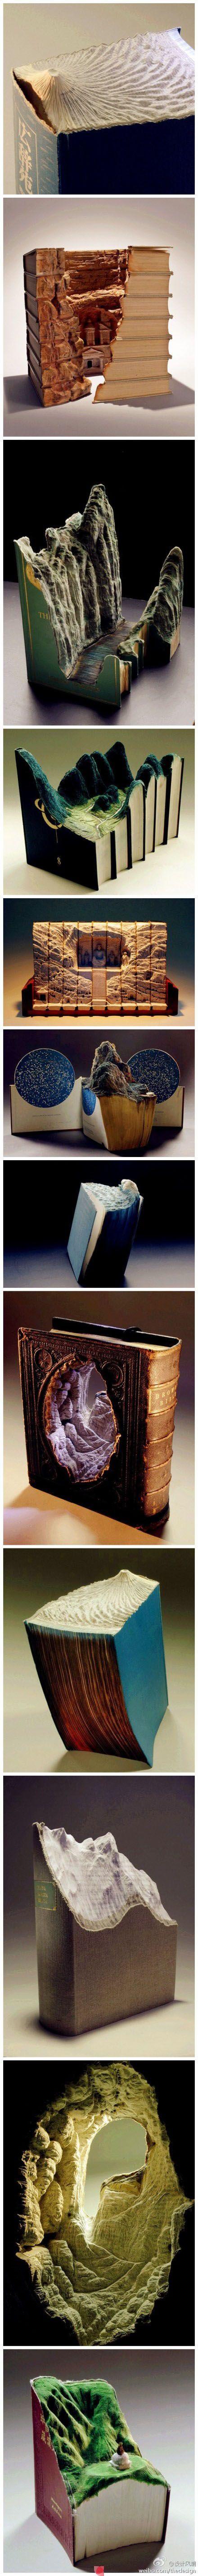 275 best book art images on pinterest book sculpture altered